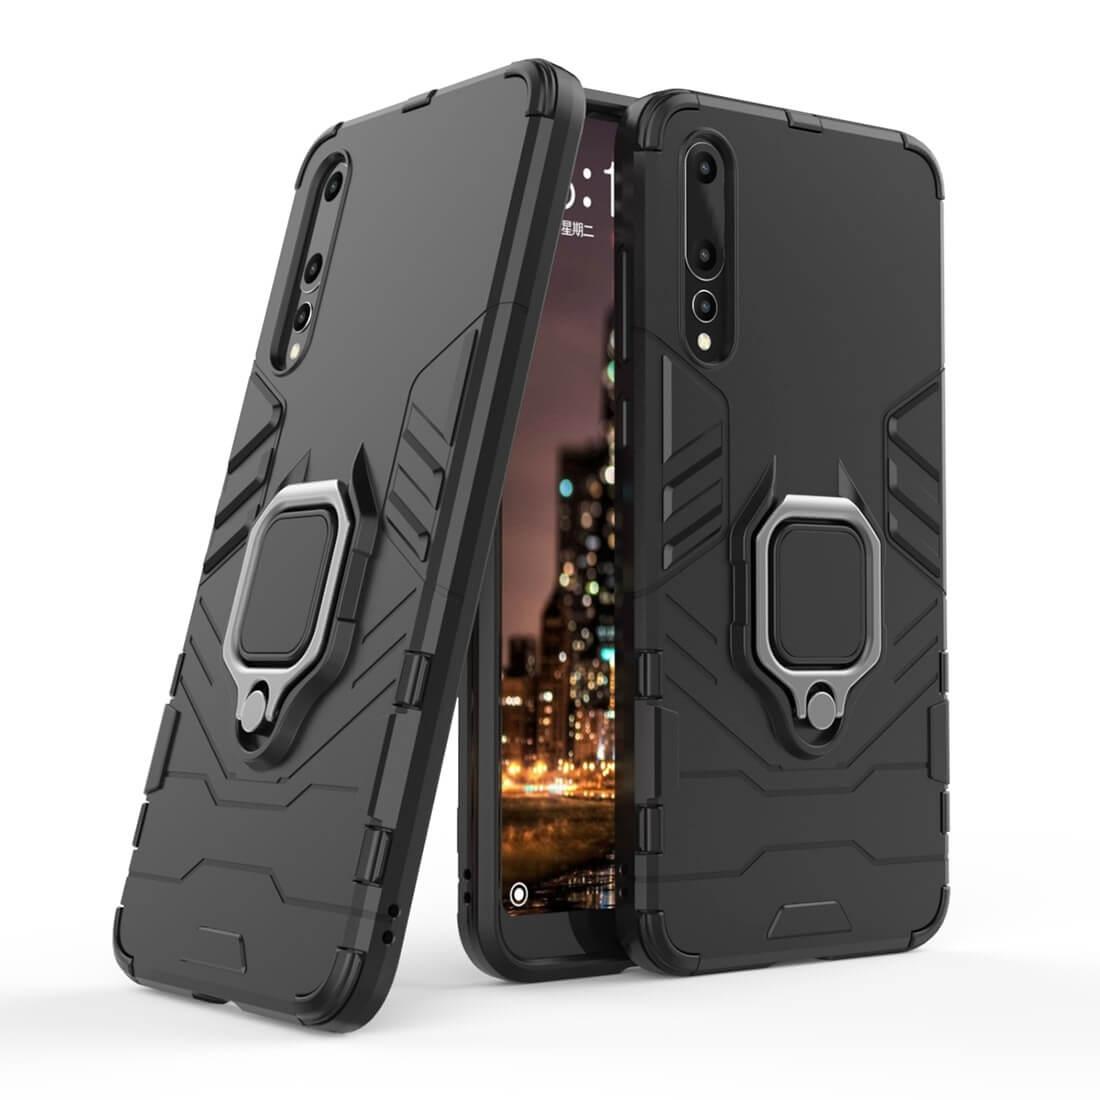 FORCELL STRONG Ochranný obal Huawei P20 Pro černý 43137c29f72